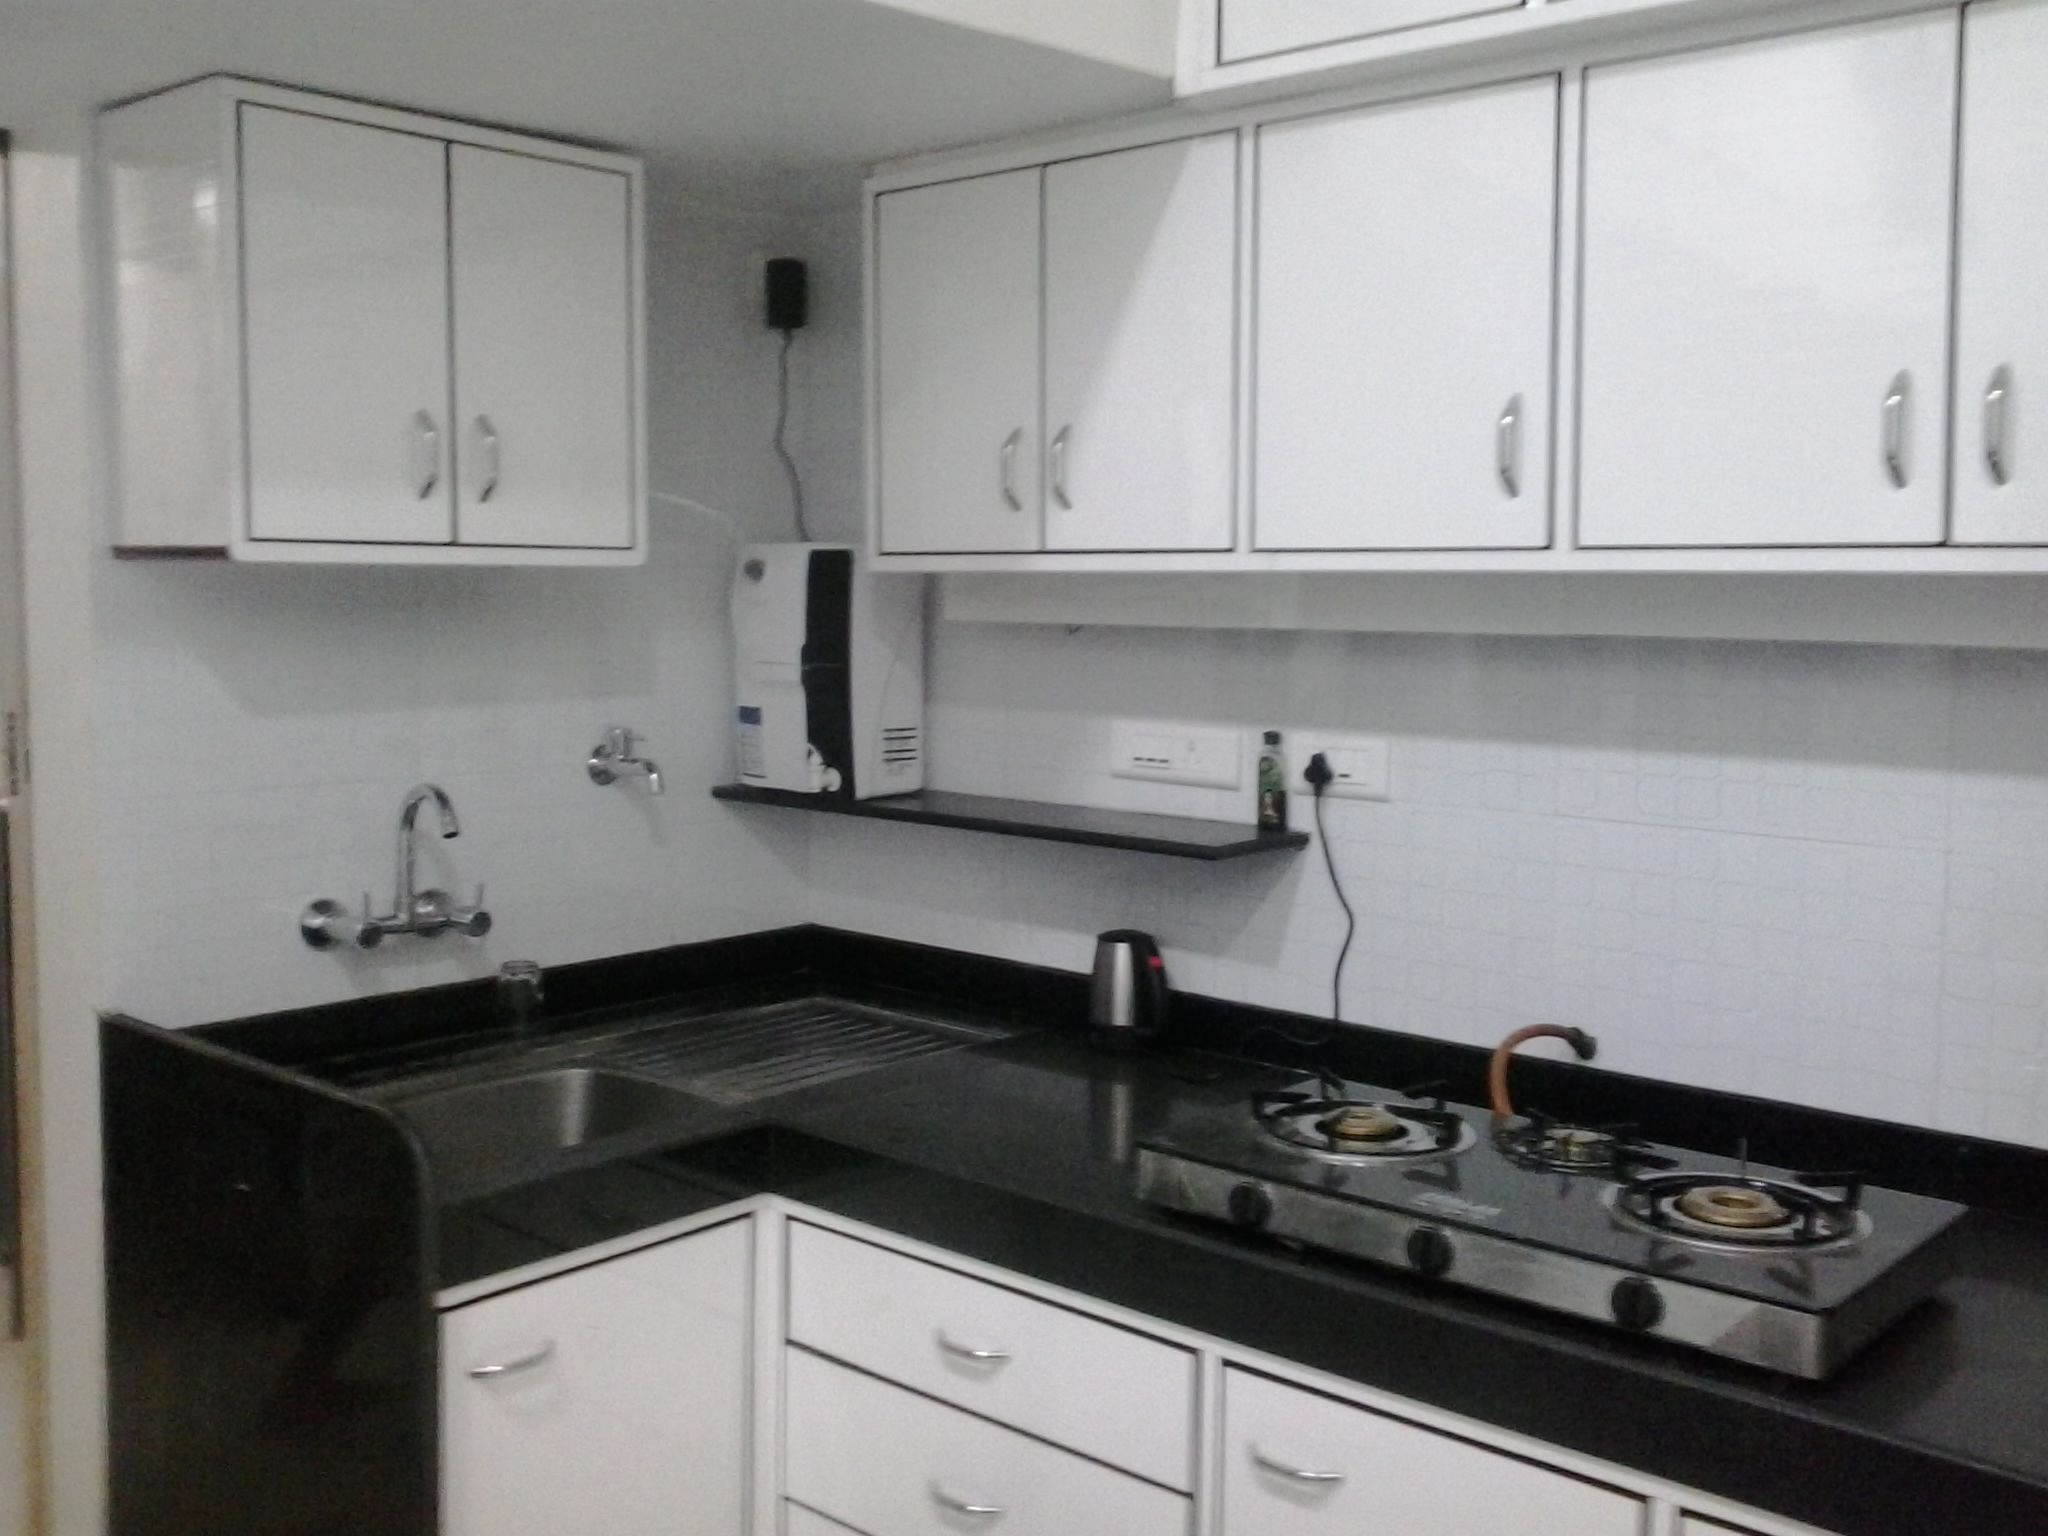 Kitchen Platform Tiles Designs Photo Gallery   Home Living ...